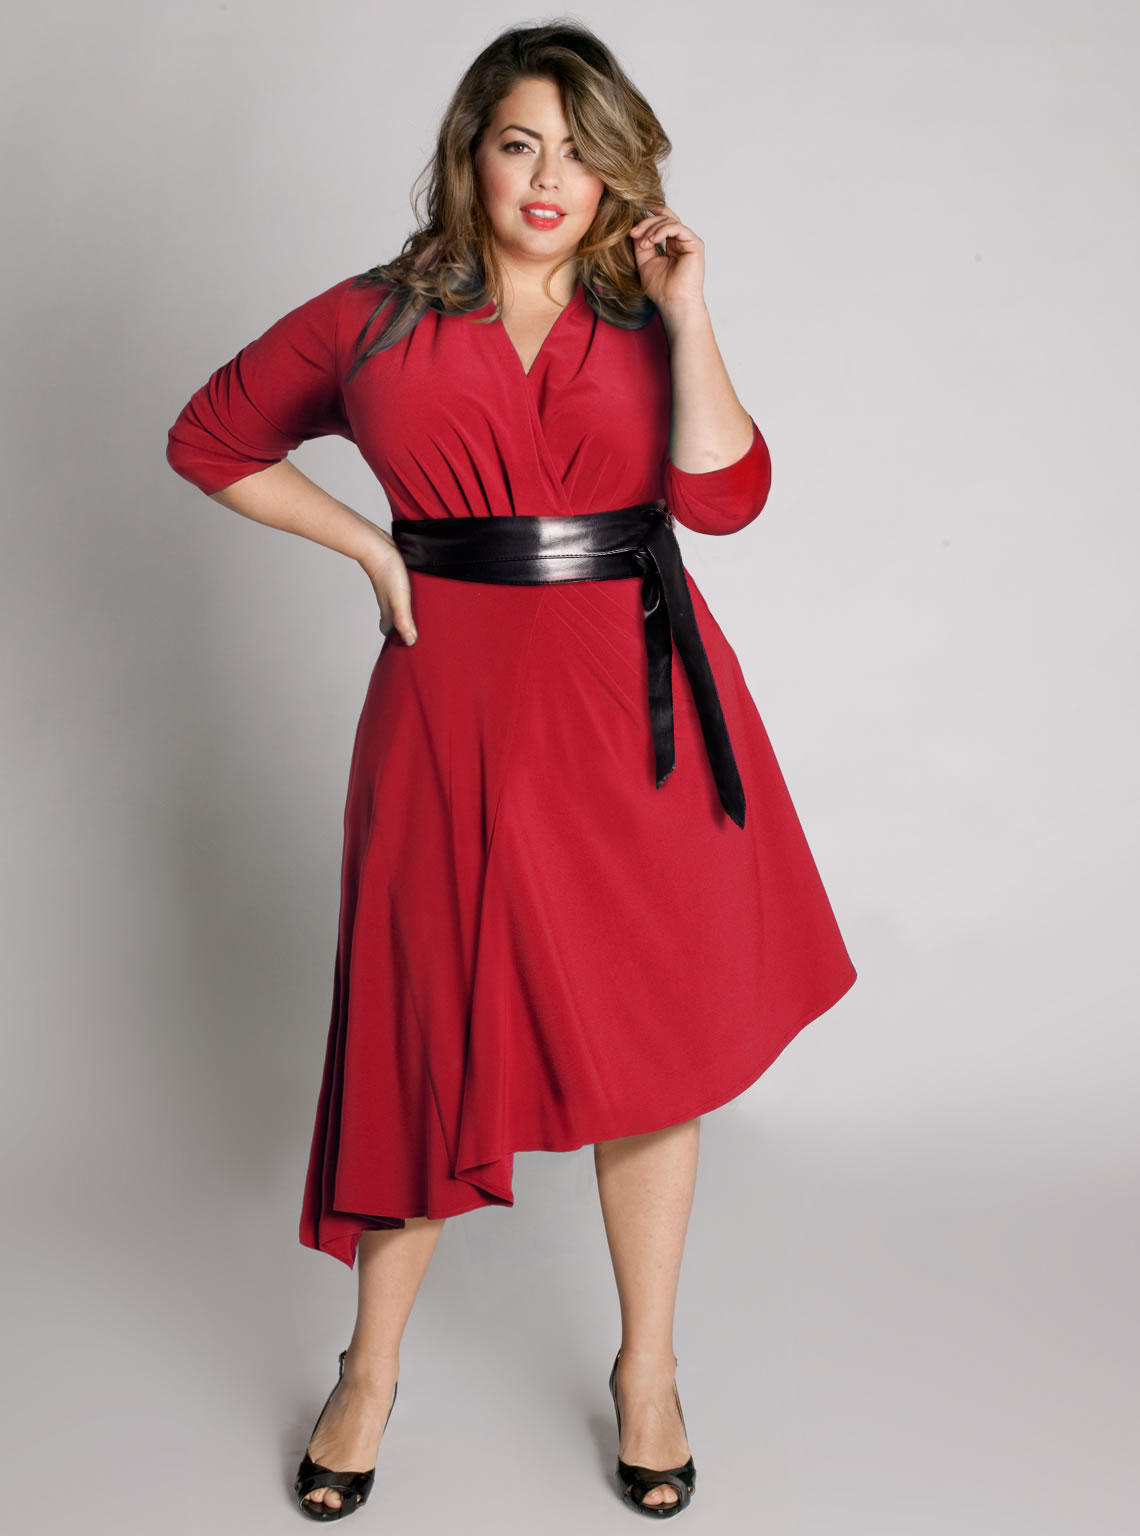 Plus size womens fashion clothing